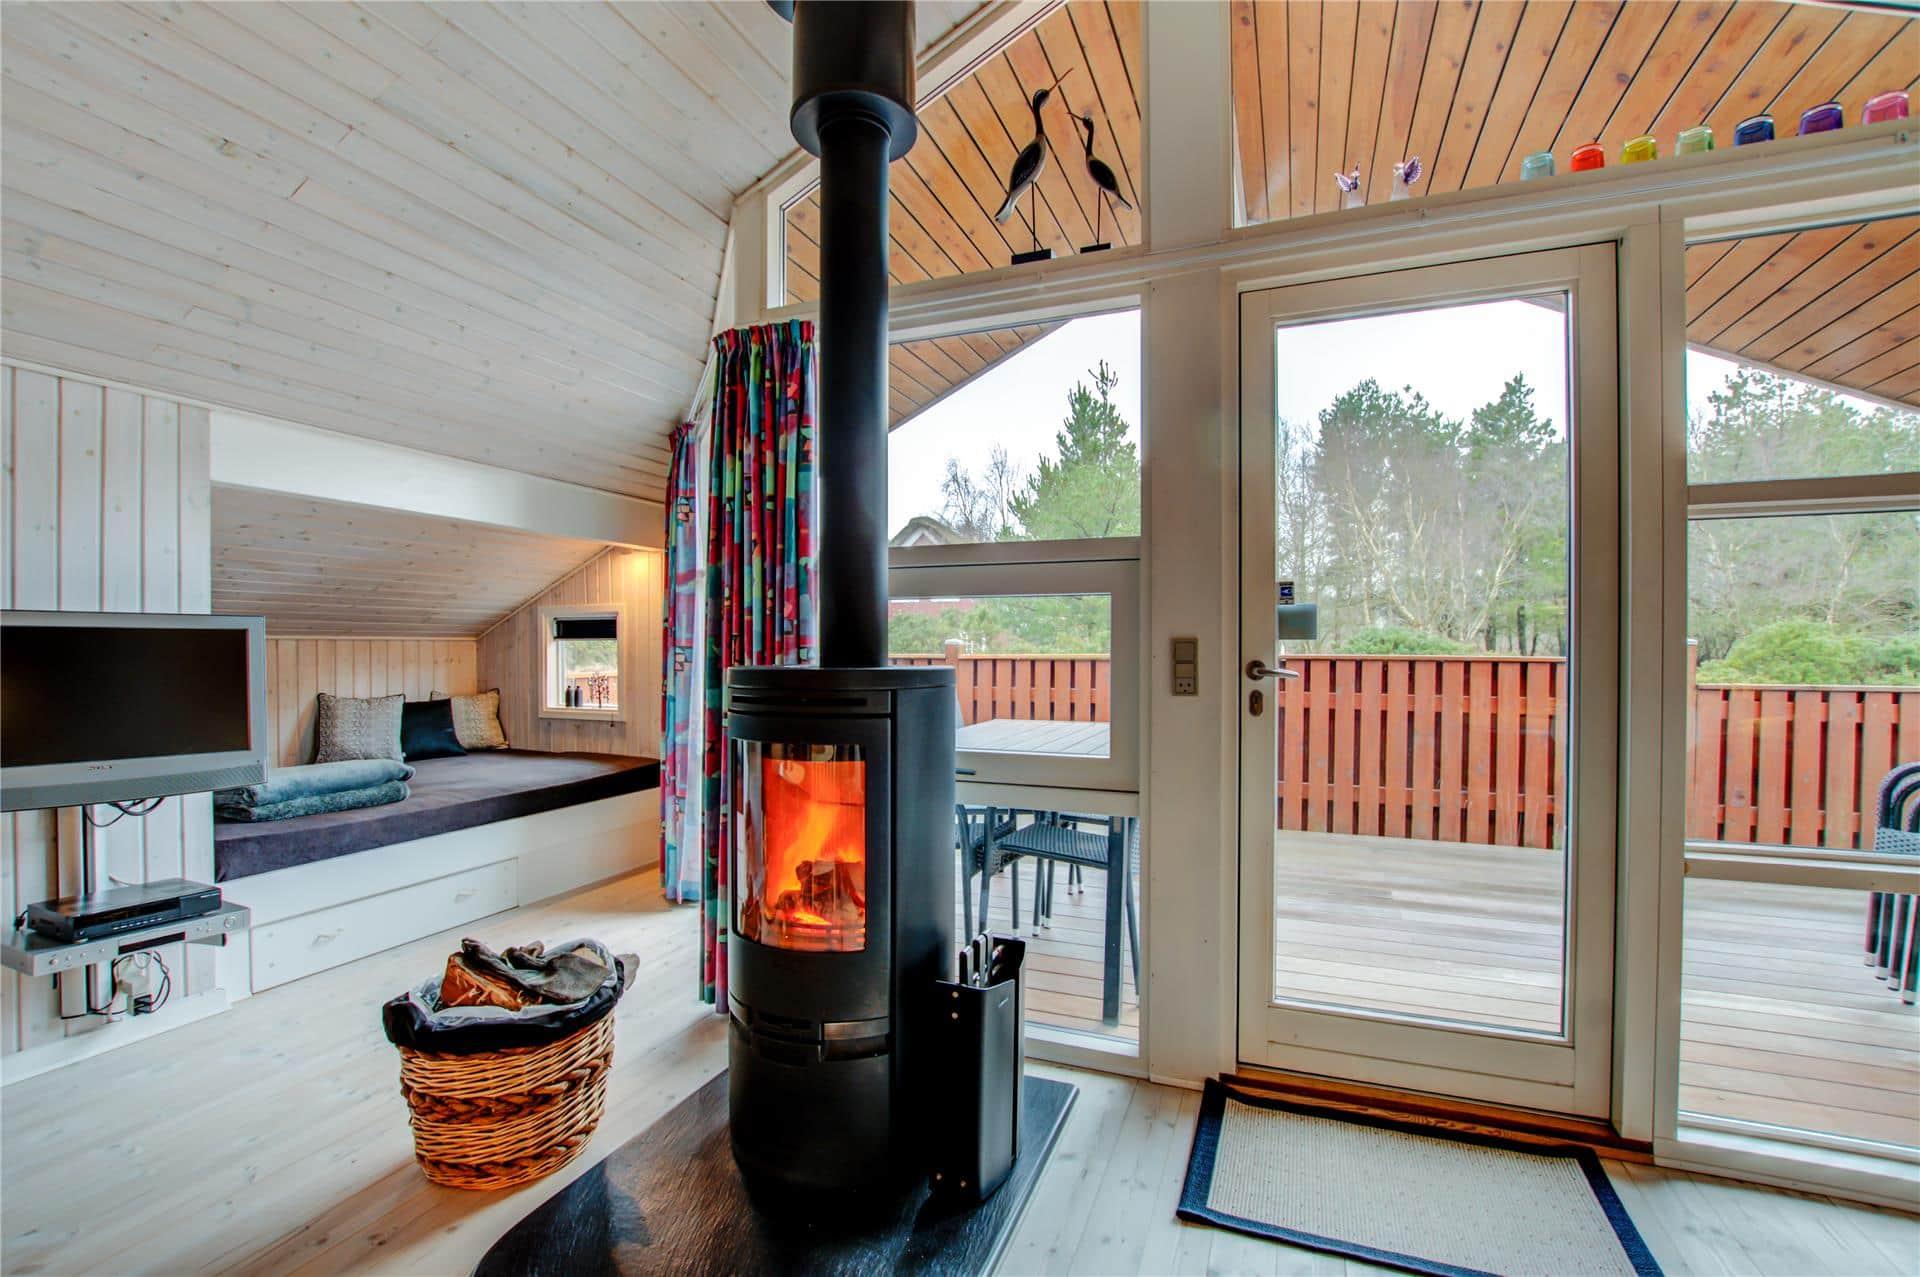 spahaus ferienhaus 0184 kongsmark r m. Black Bedroom Furniture Sets. Home Design Ideas